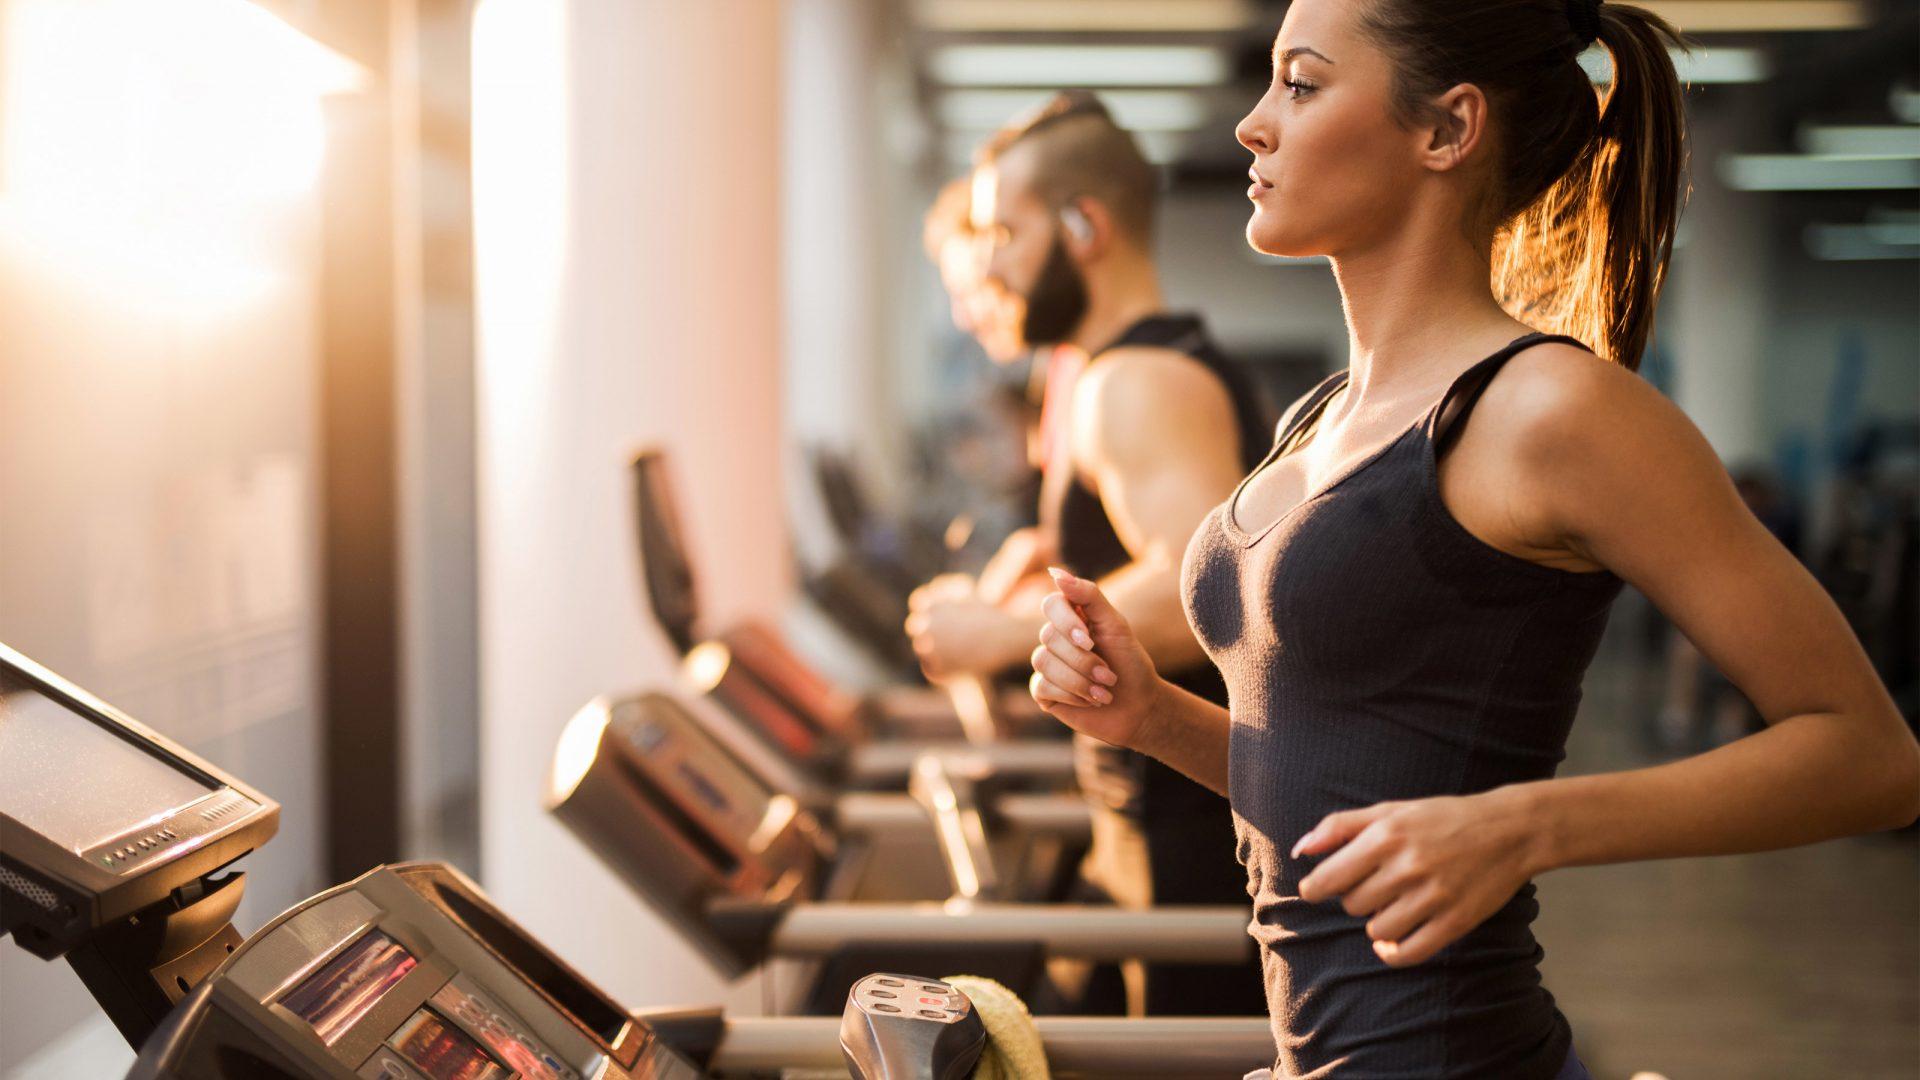 Work nuffield health treadmill